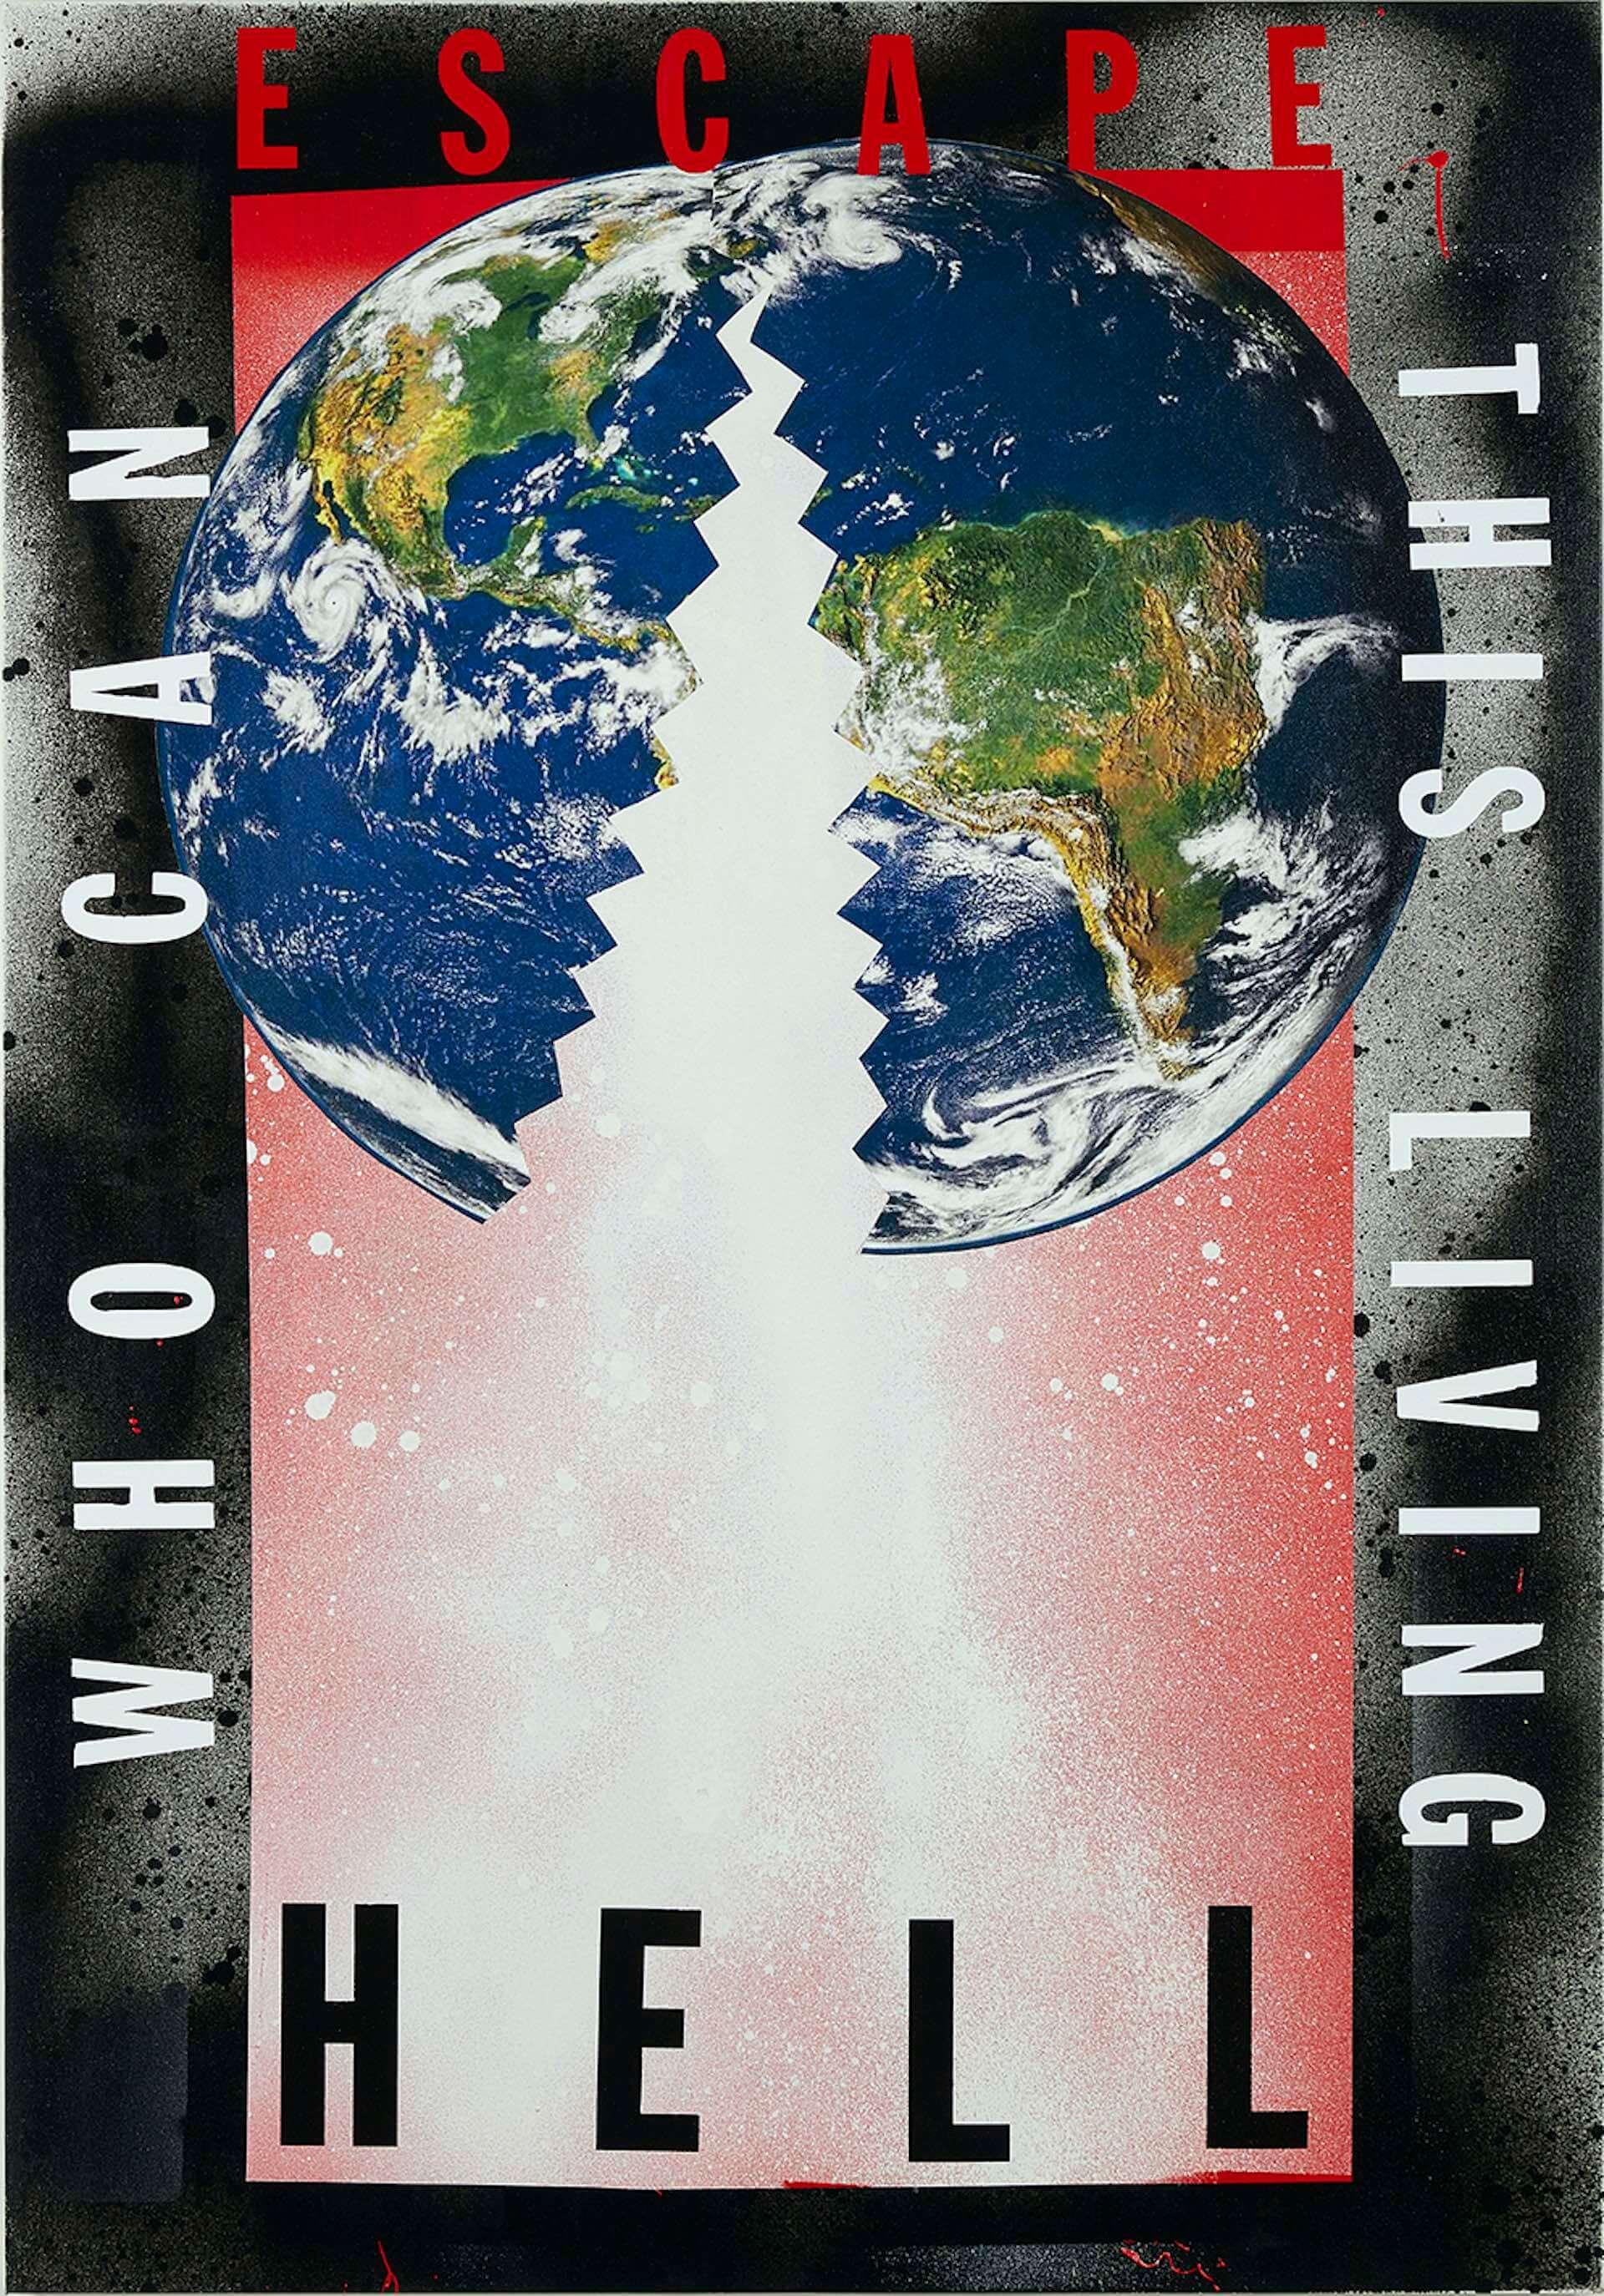 Kanye Westにも作品提供するCali Thornhill DeWittの展覧会<TOKYO OLYMPICS>がGALLERY COMMONにて明日開幕! art2000820_cali-thornhill-deWitt_1-1920x2749